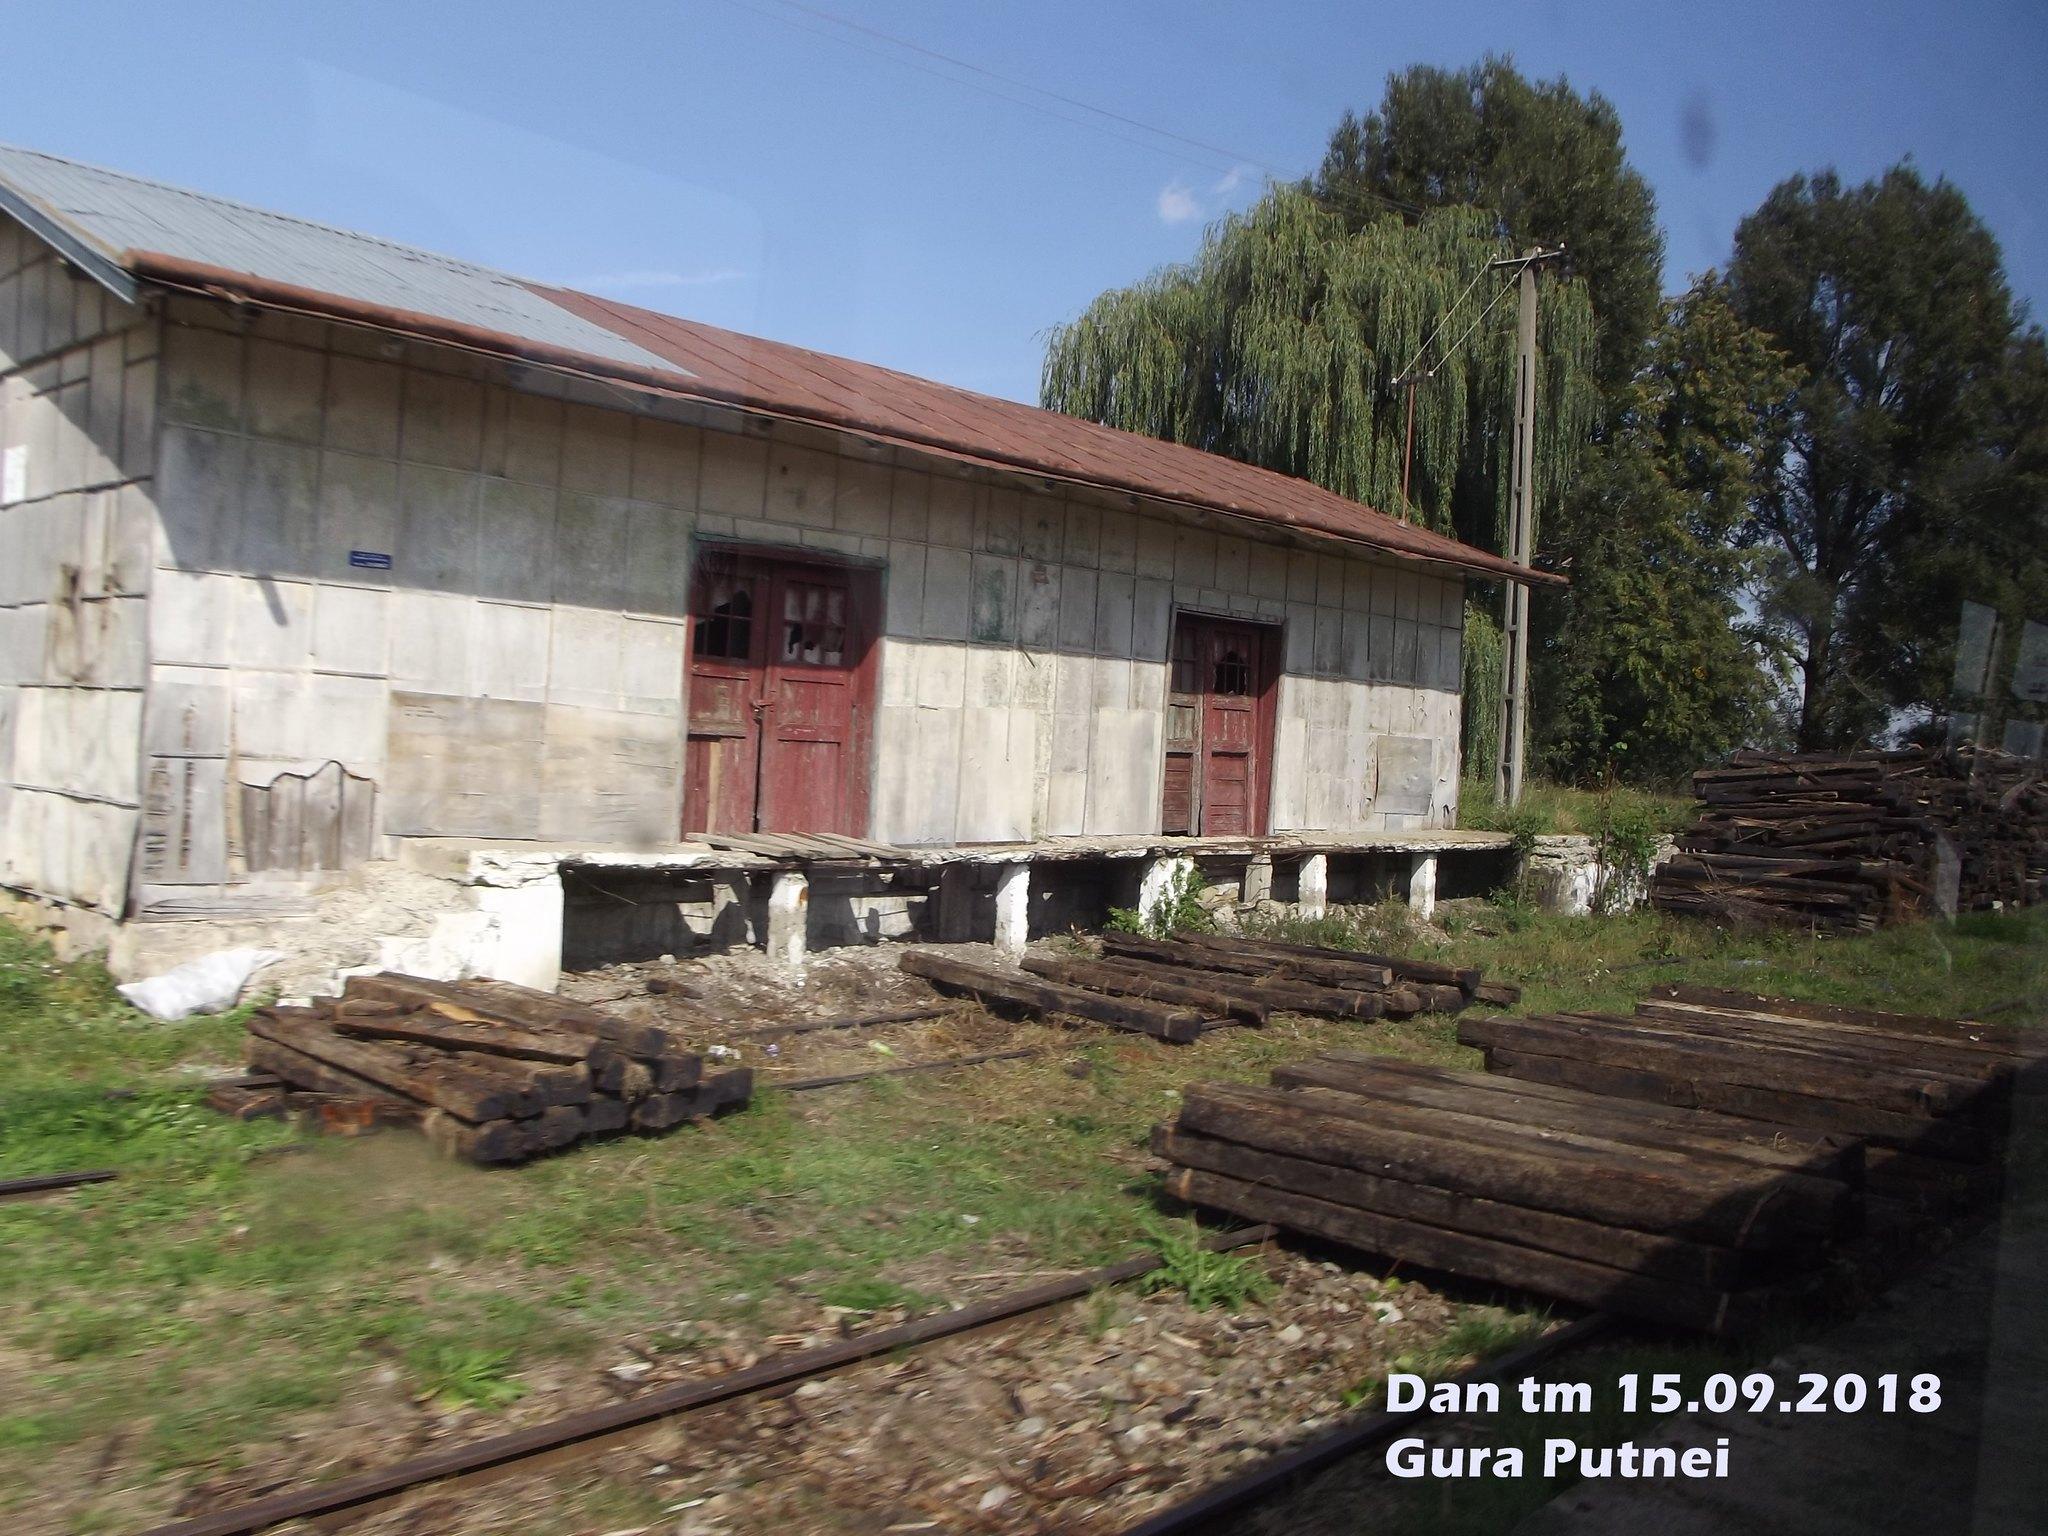 515 : Dorneşti - Gura Putnei - (Putna) - Nisipitu - Seletin UKR - Pagina 47 44734659611_9c6eafc30c_k